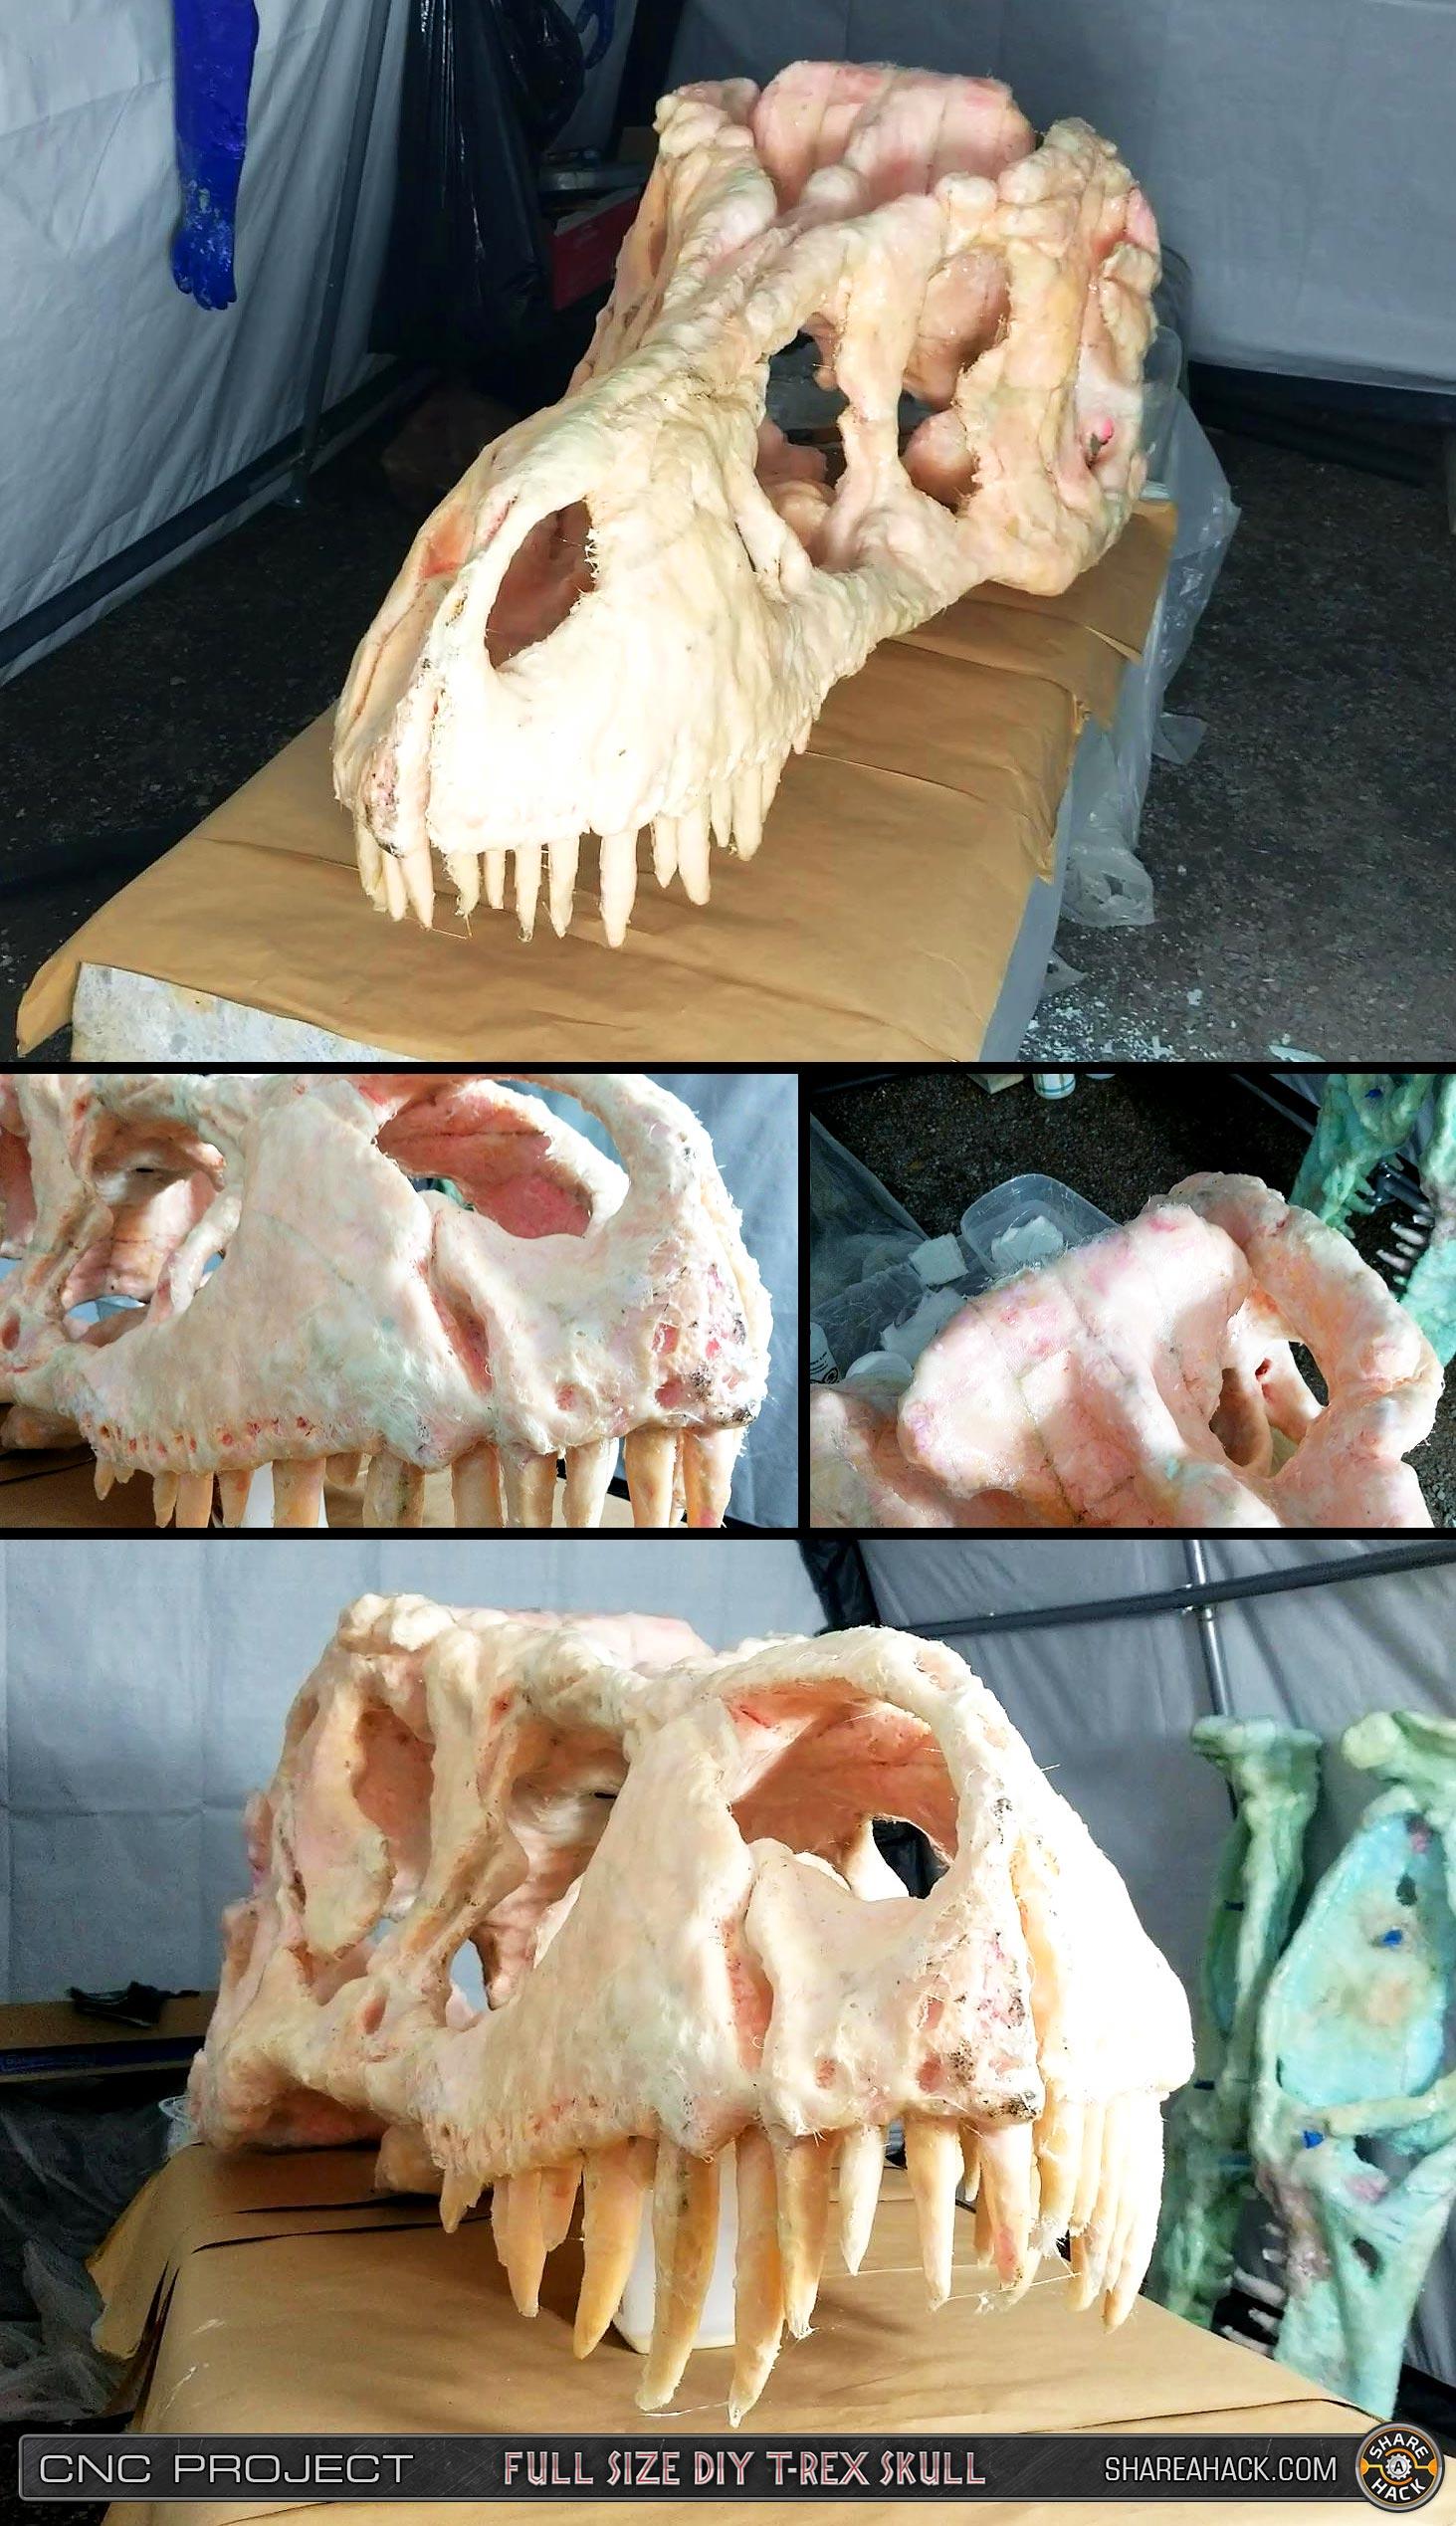 shareahack_diy-trex-skull-cnc-foam_3dmodel_33-fiberglassed.jpg